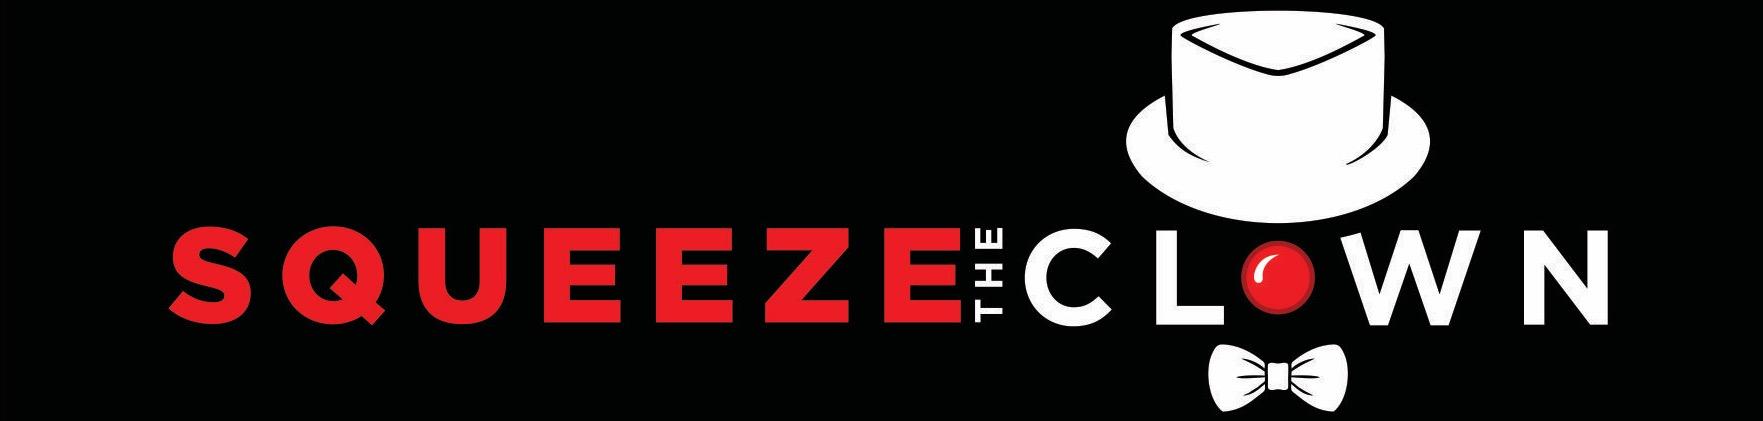 squeeze logo Black.jpg